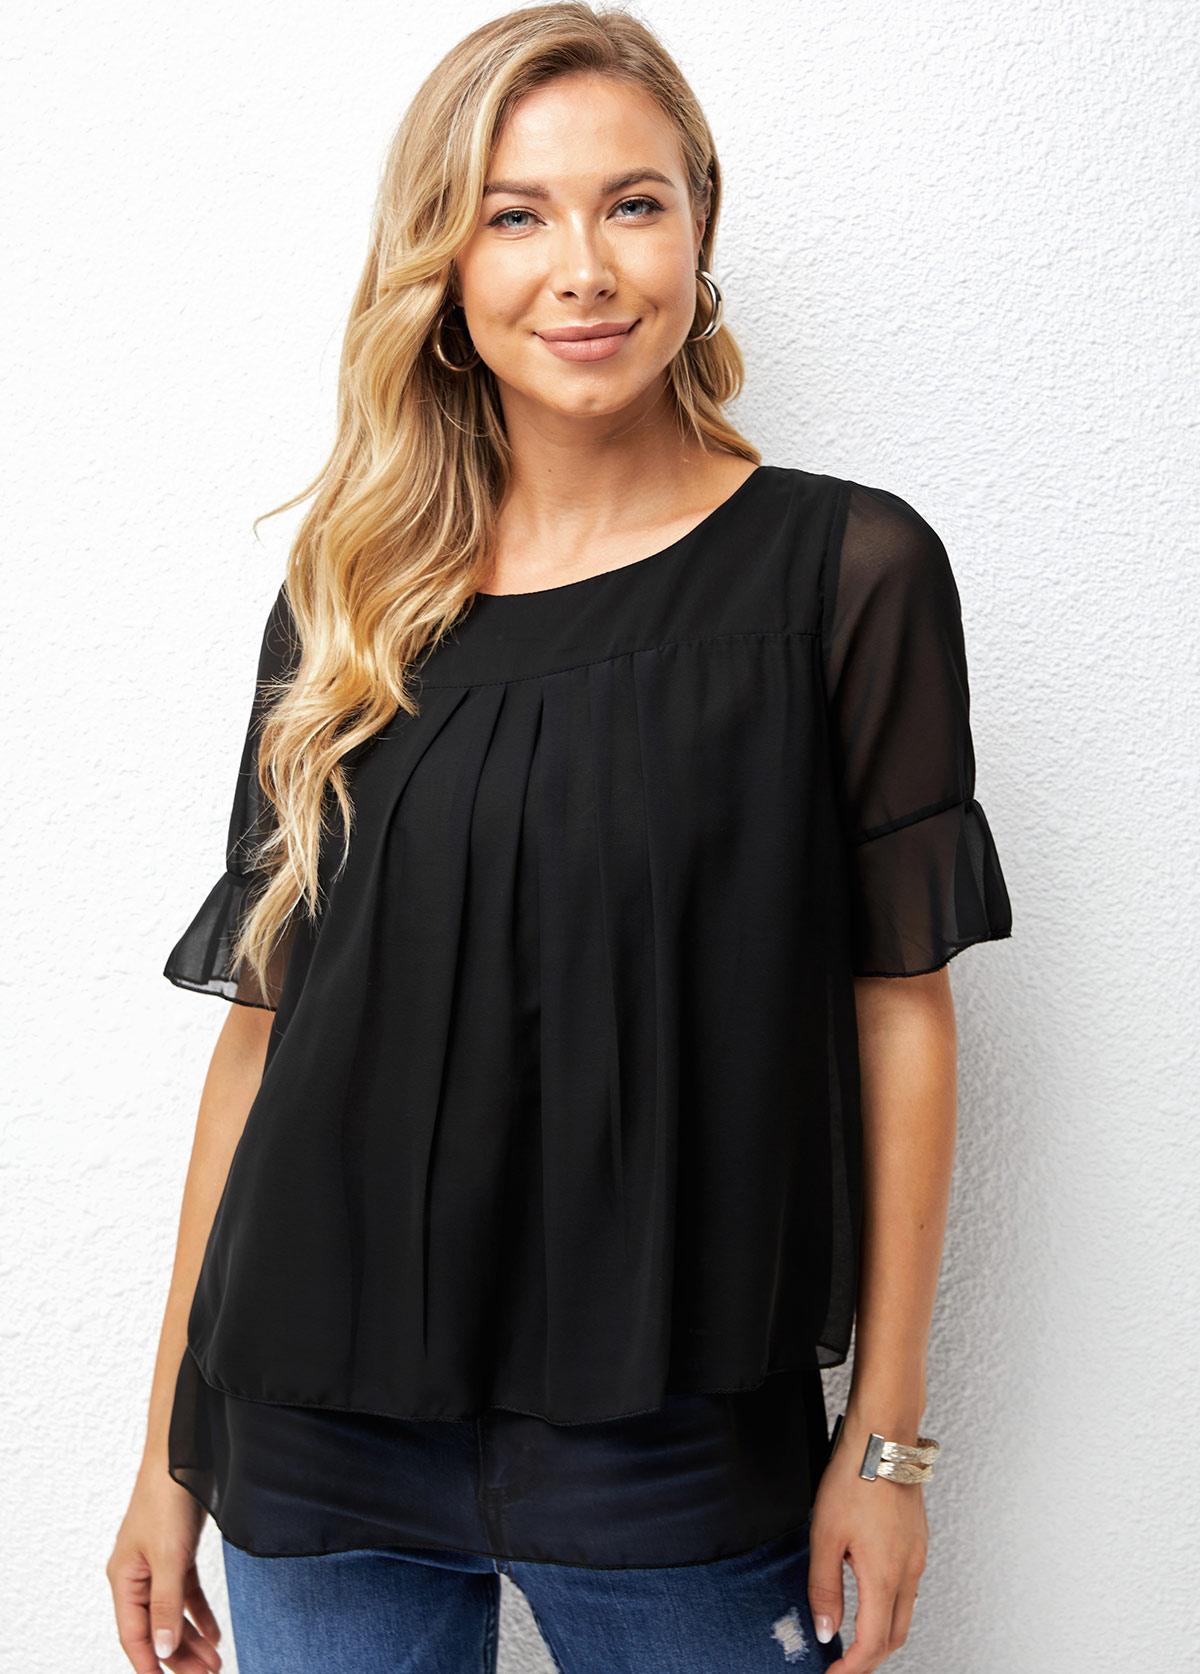 Short Sleeve Chiffon Round Neck T Shirt